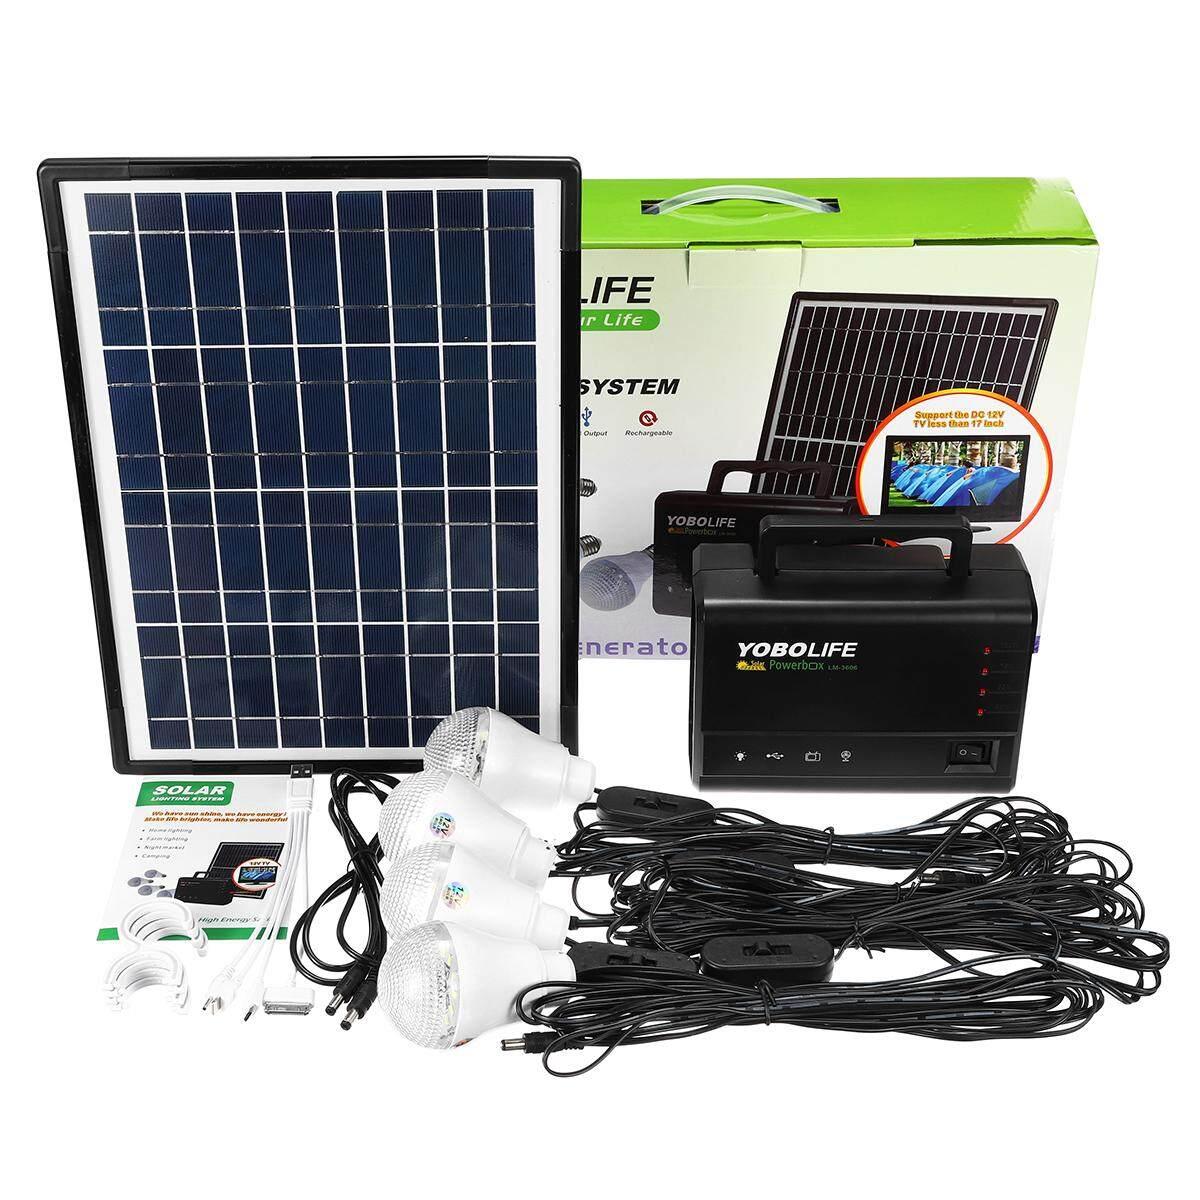 Power Storage Generator Solar Panel LED USB Charger Home System 18W 110-220V - intl